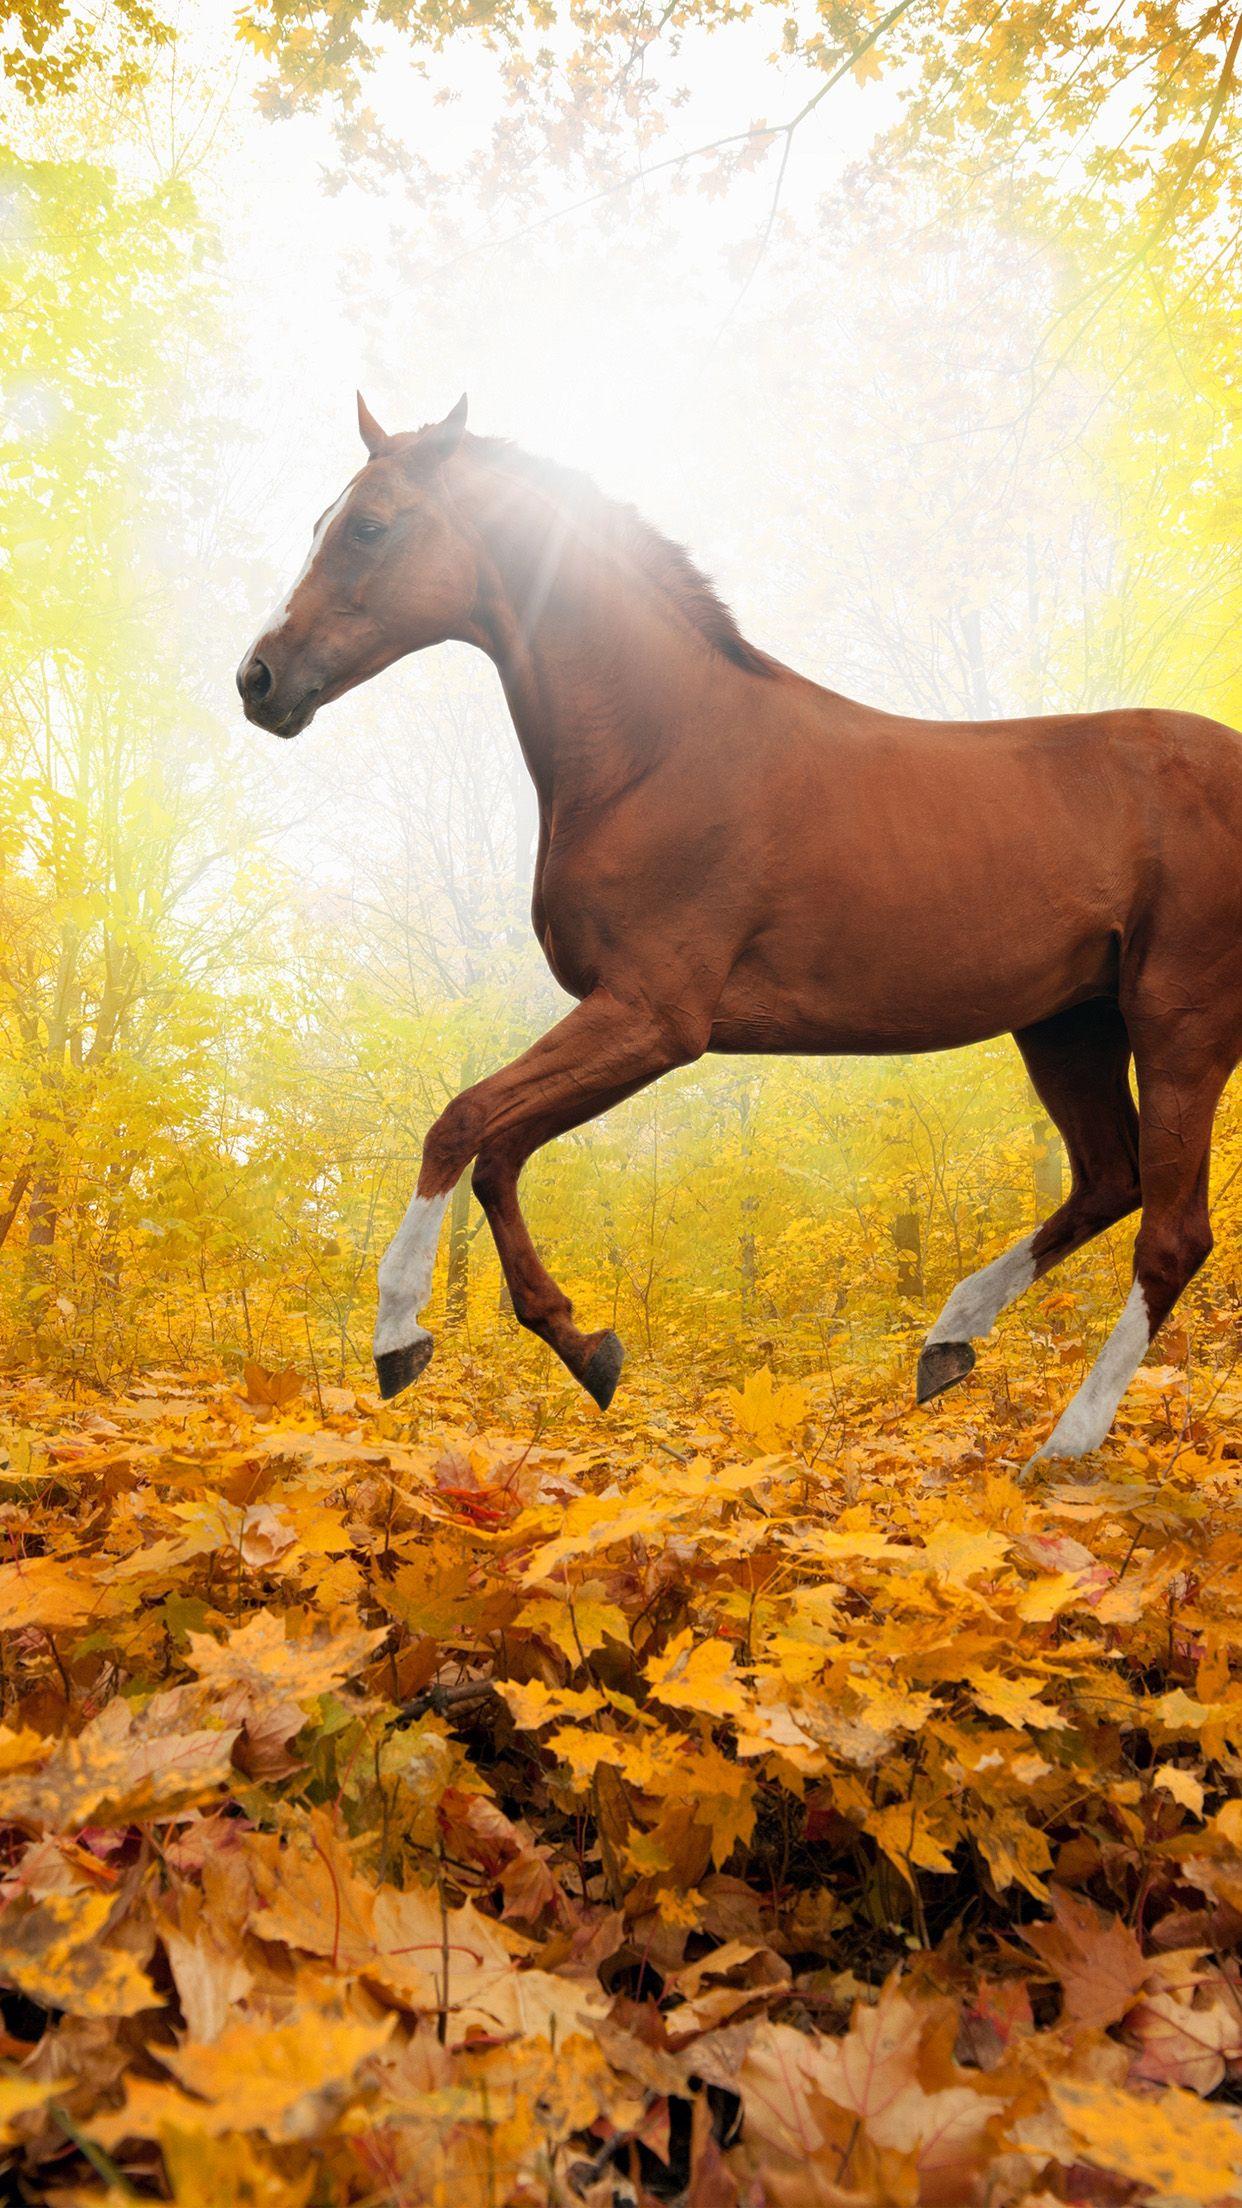 awesome horseartanimalfallleafmountainrediphone6